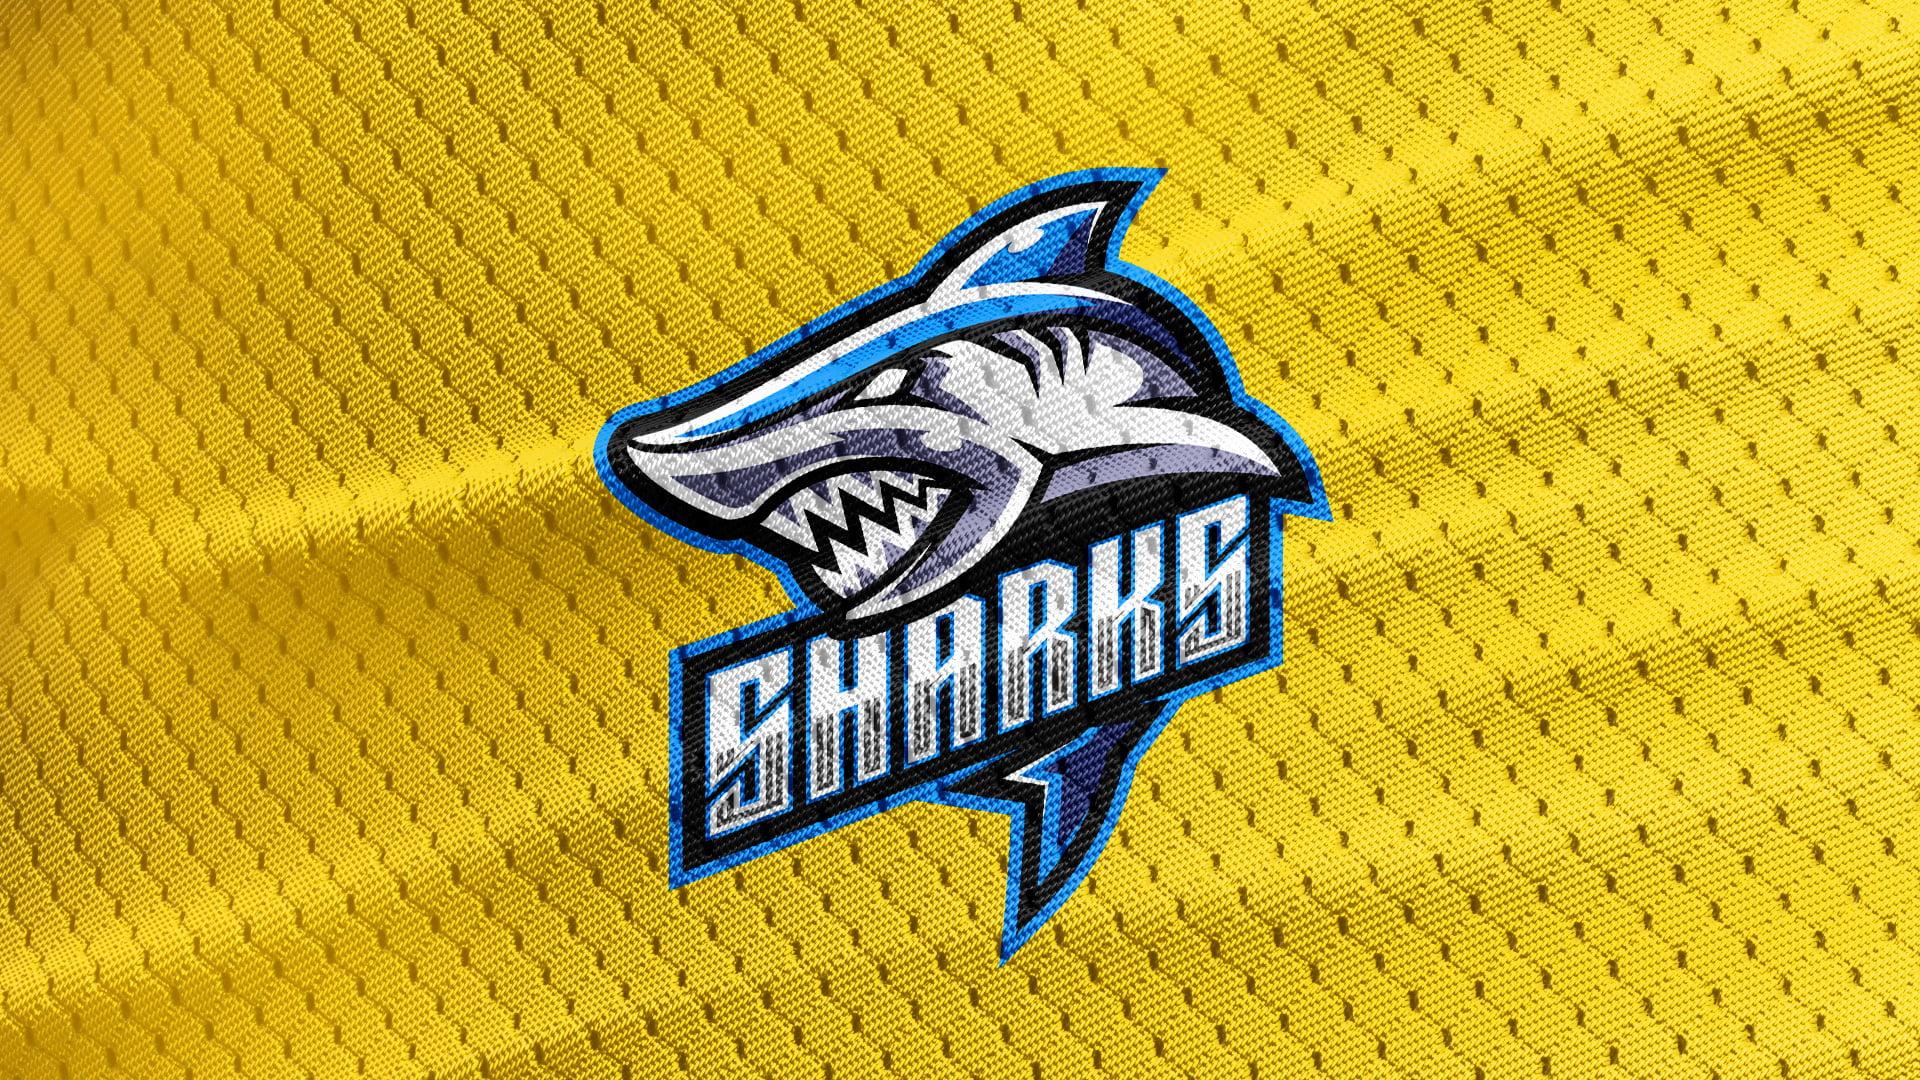 Yellow-Texture-Free-Shark-Logo-Mascot-Download